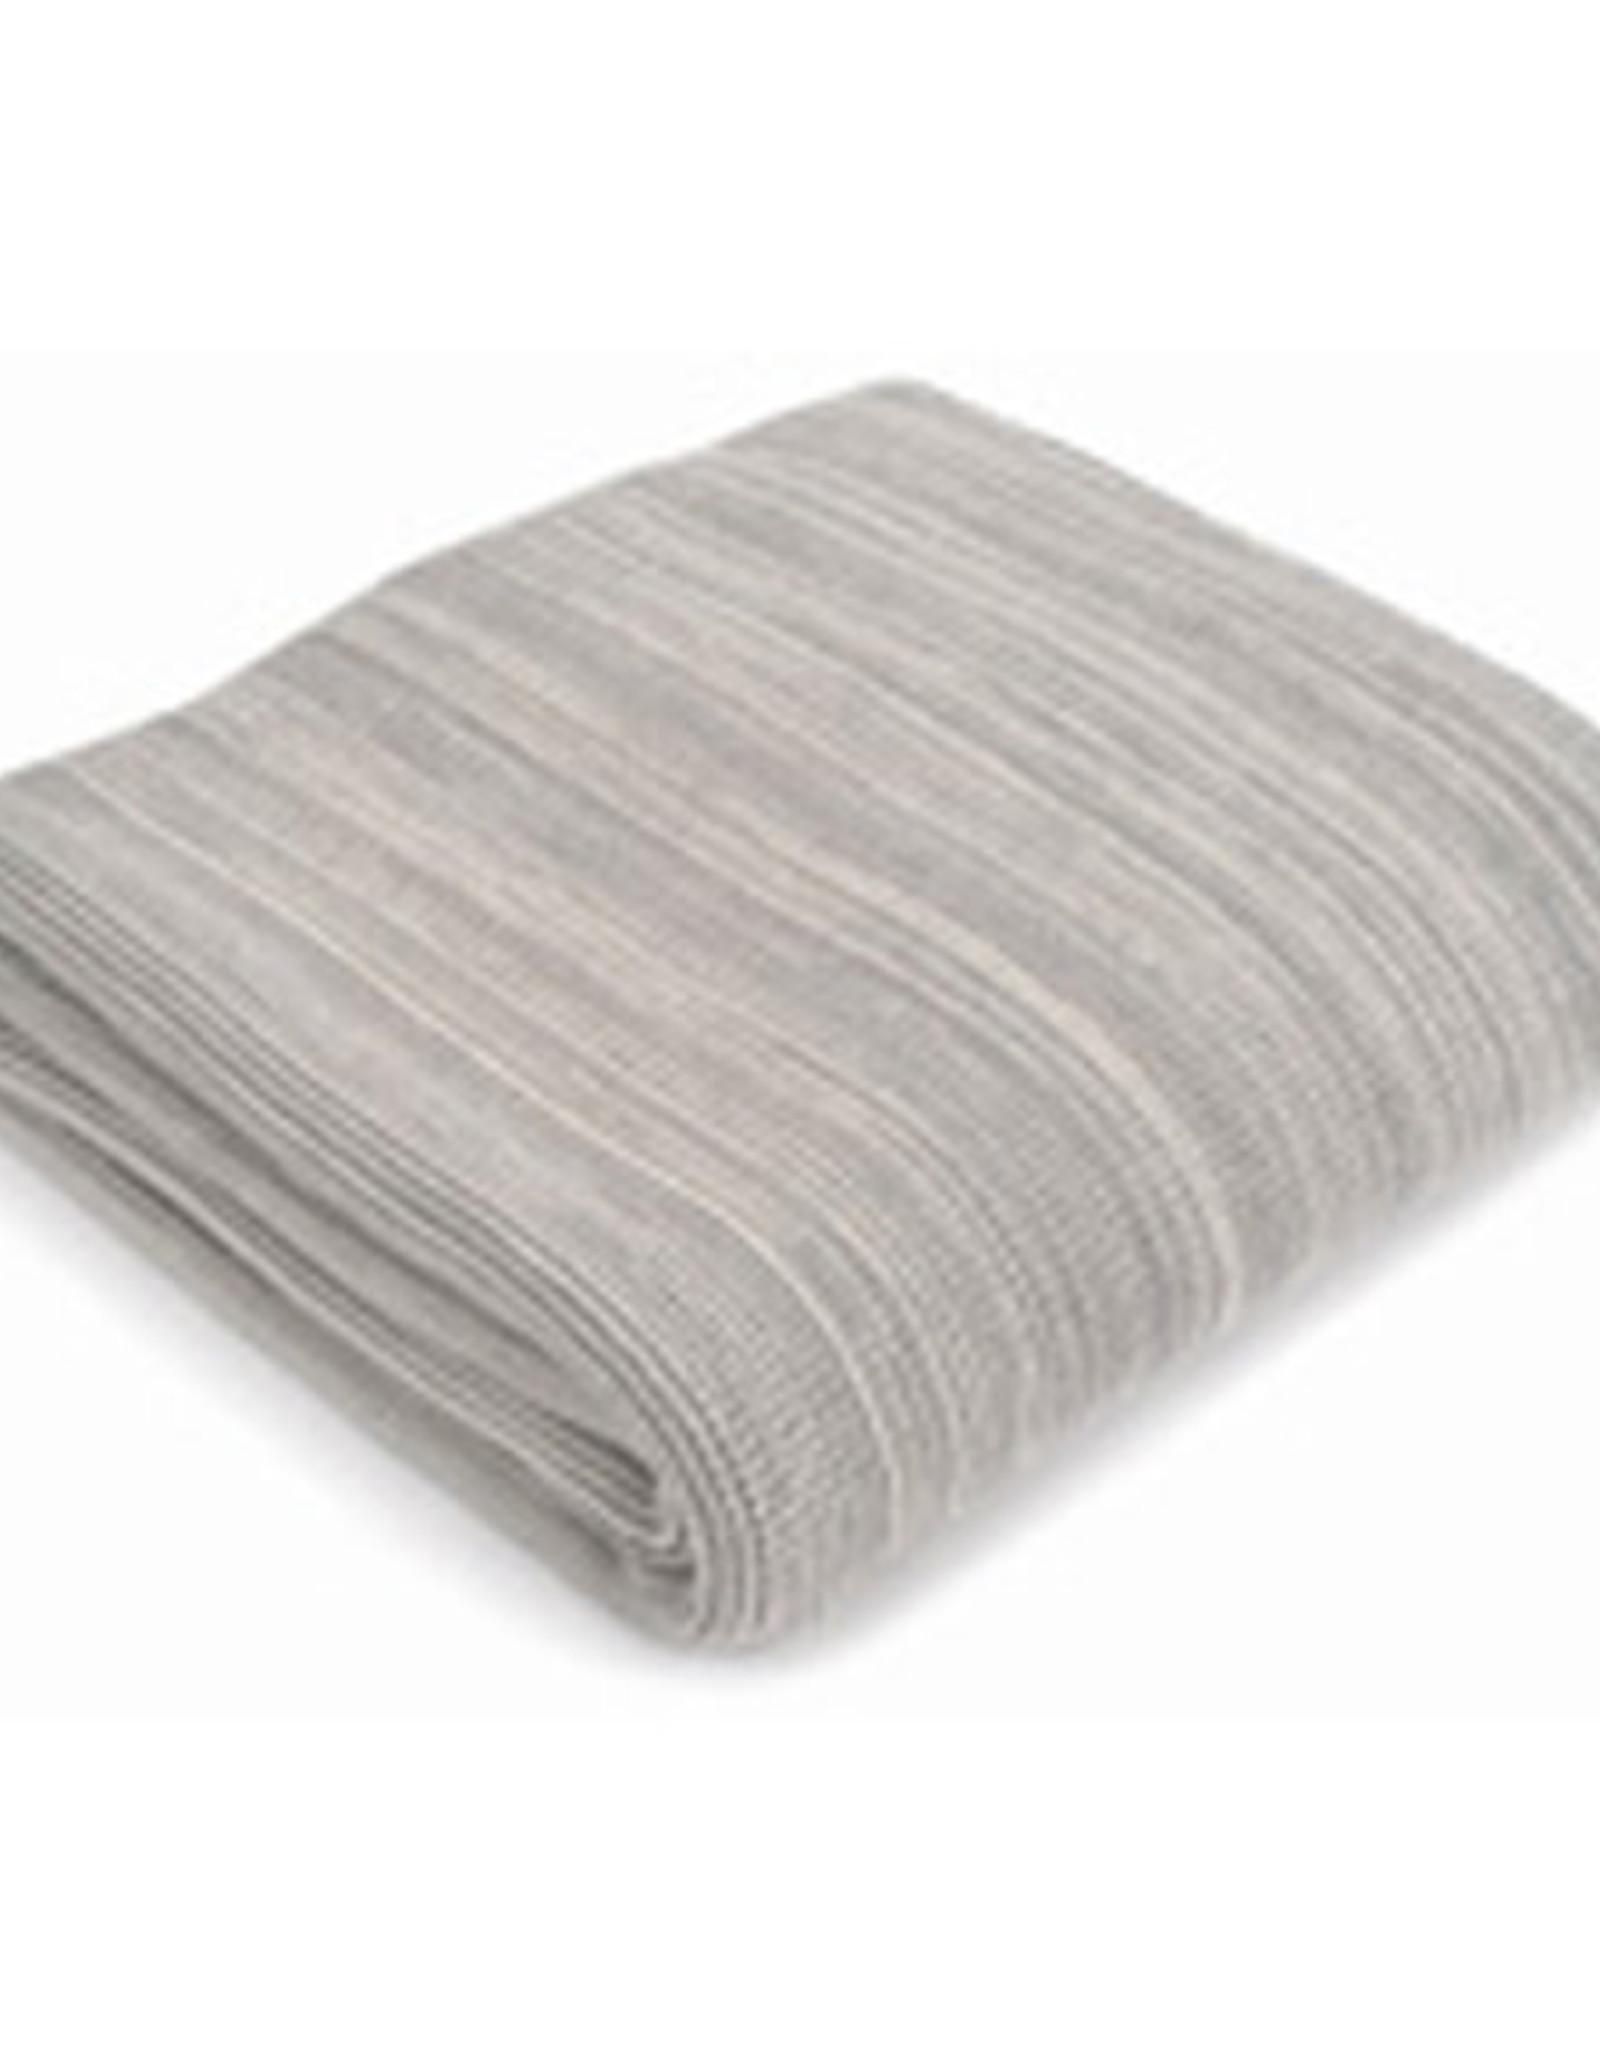 "50 x 60"" Small Stitch Light Grey Cotton Blanket"